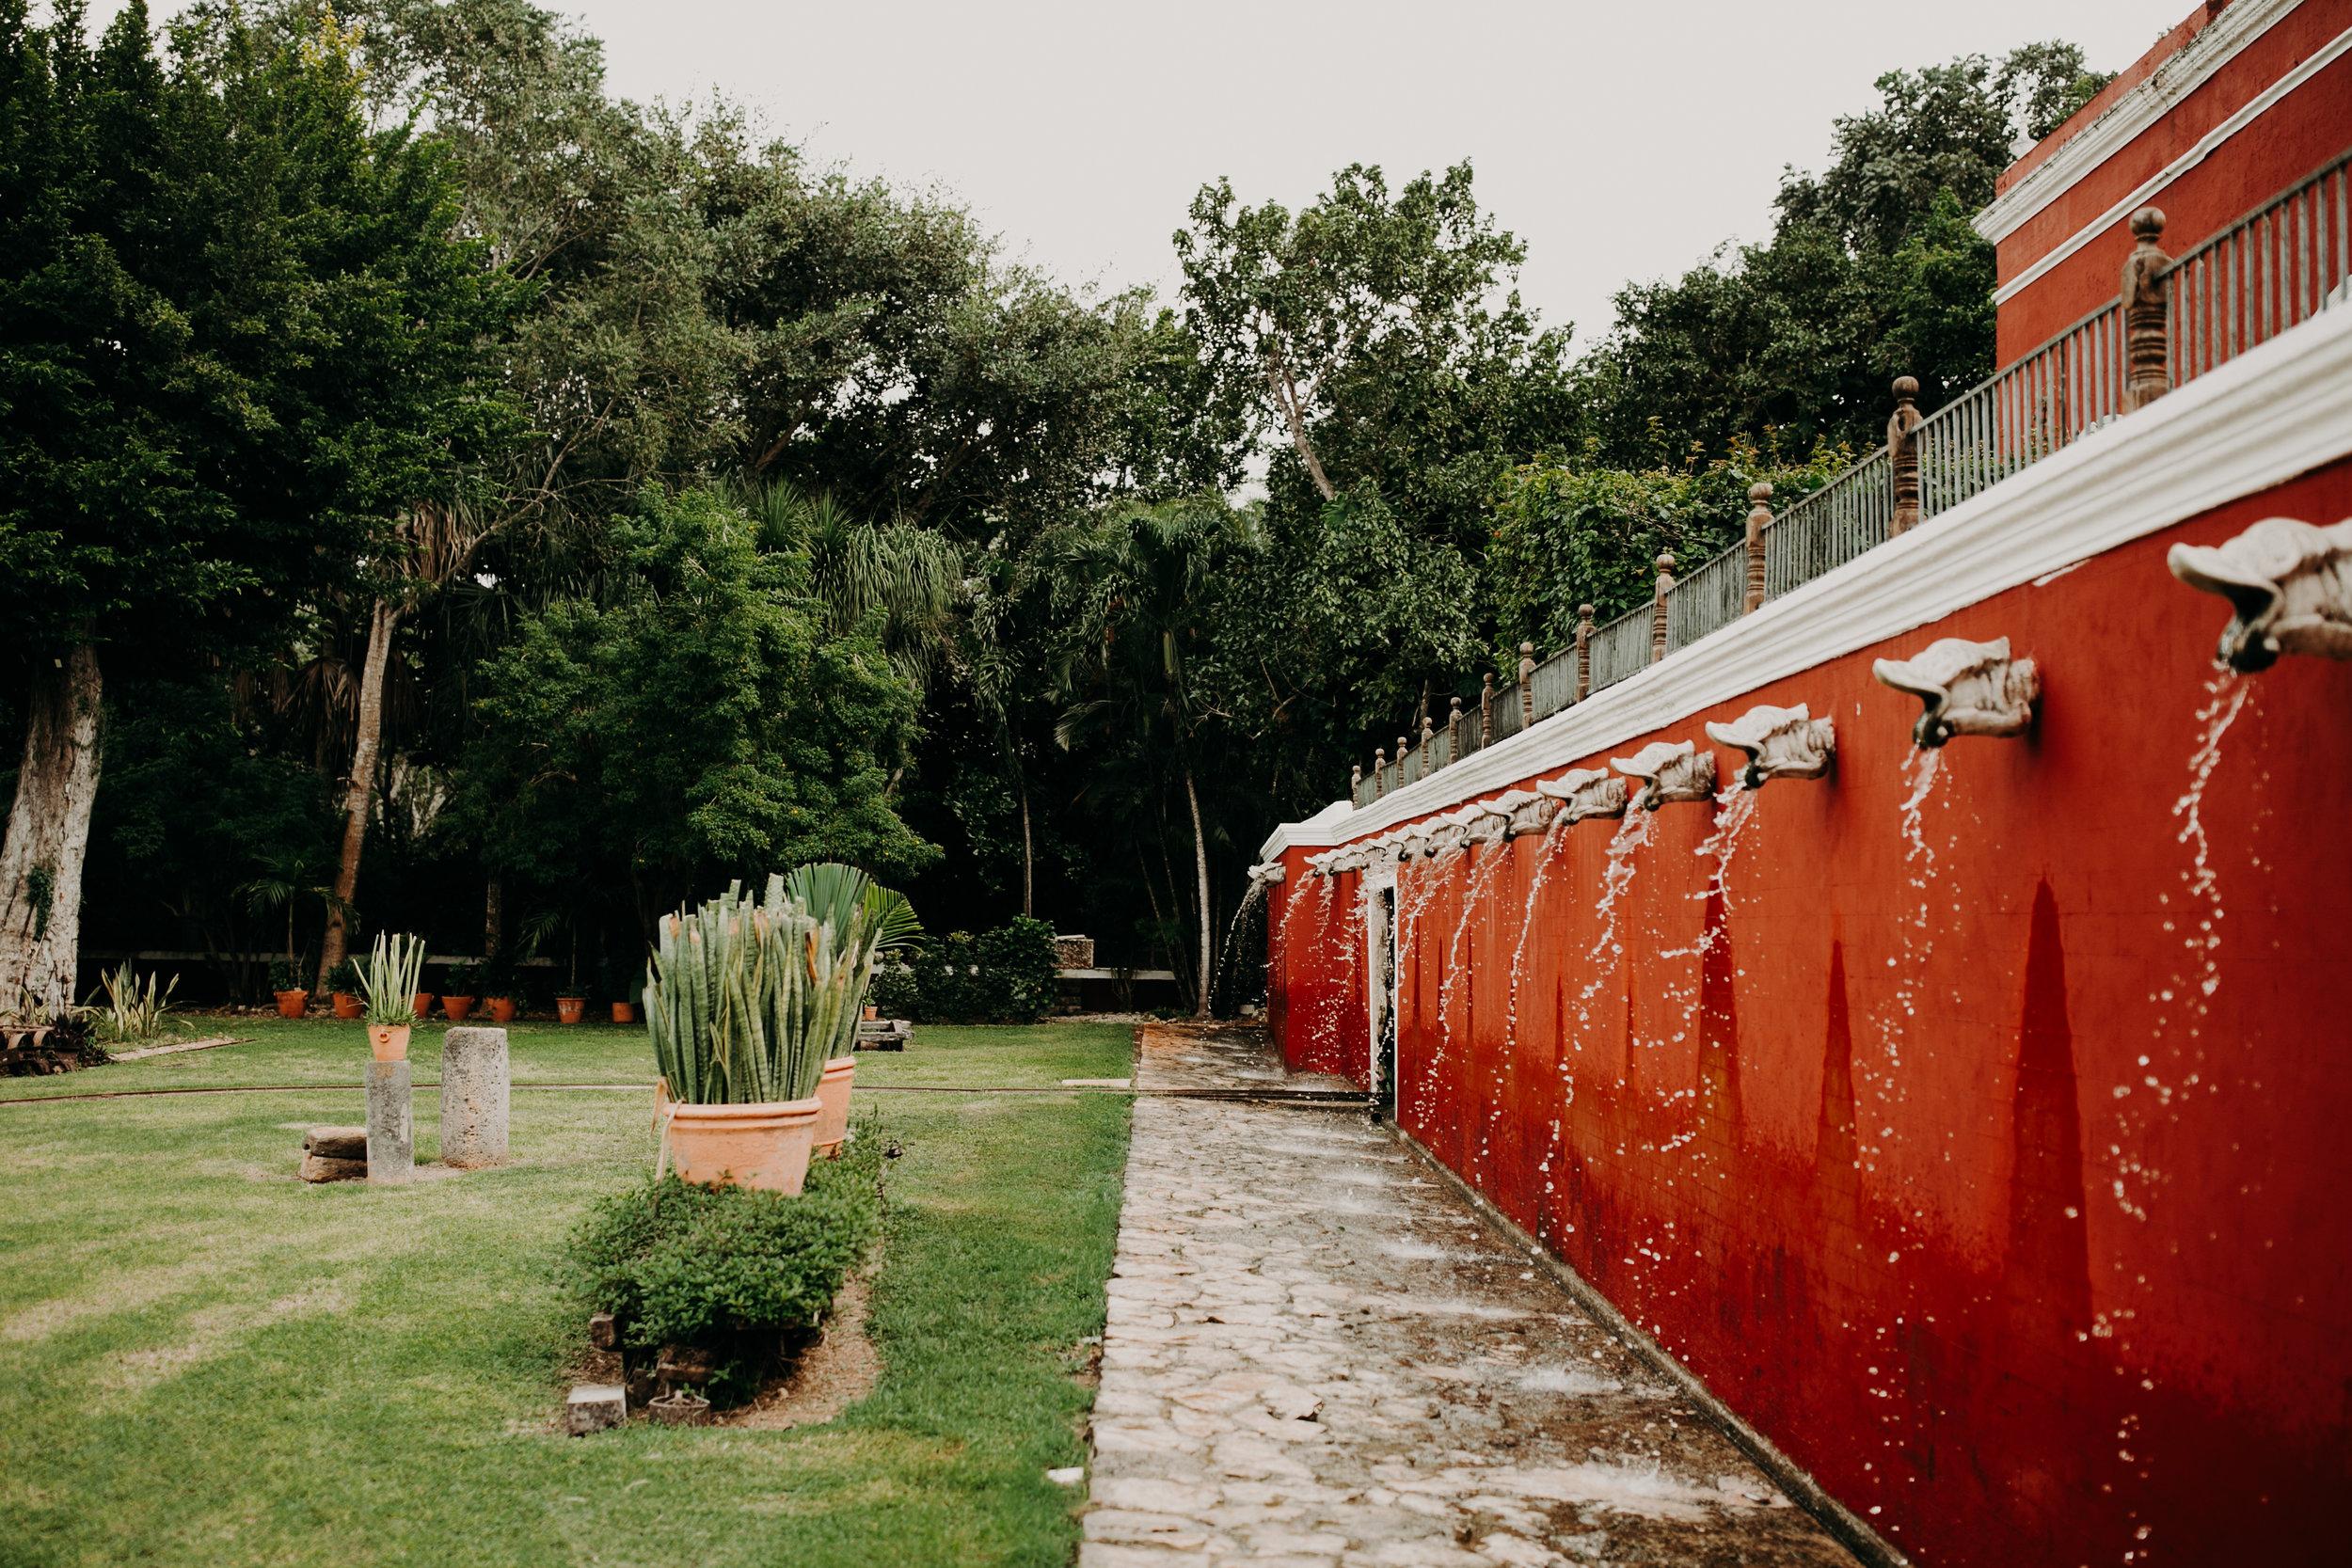 Hacienda Temozon Yucatan Mexico Wedding | Ida & Peter Emily Magers Photography-321.jpg